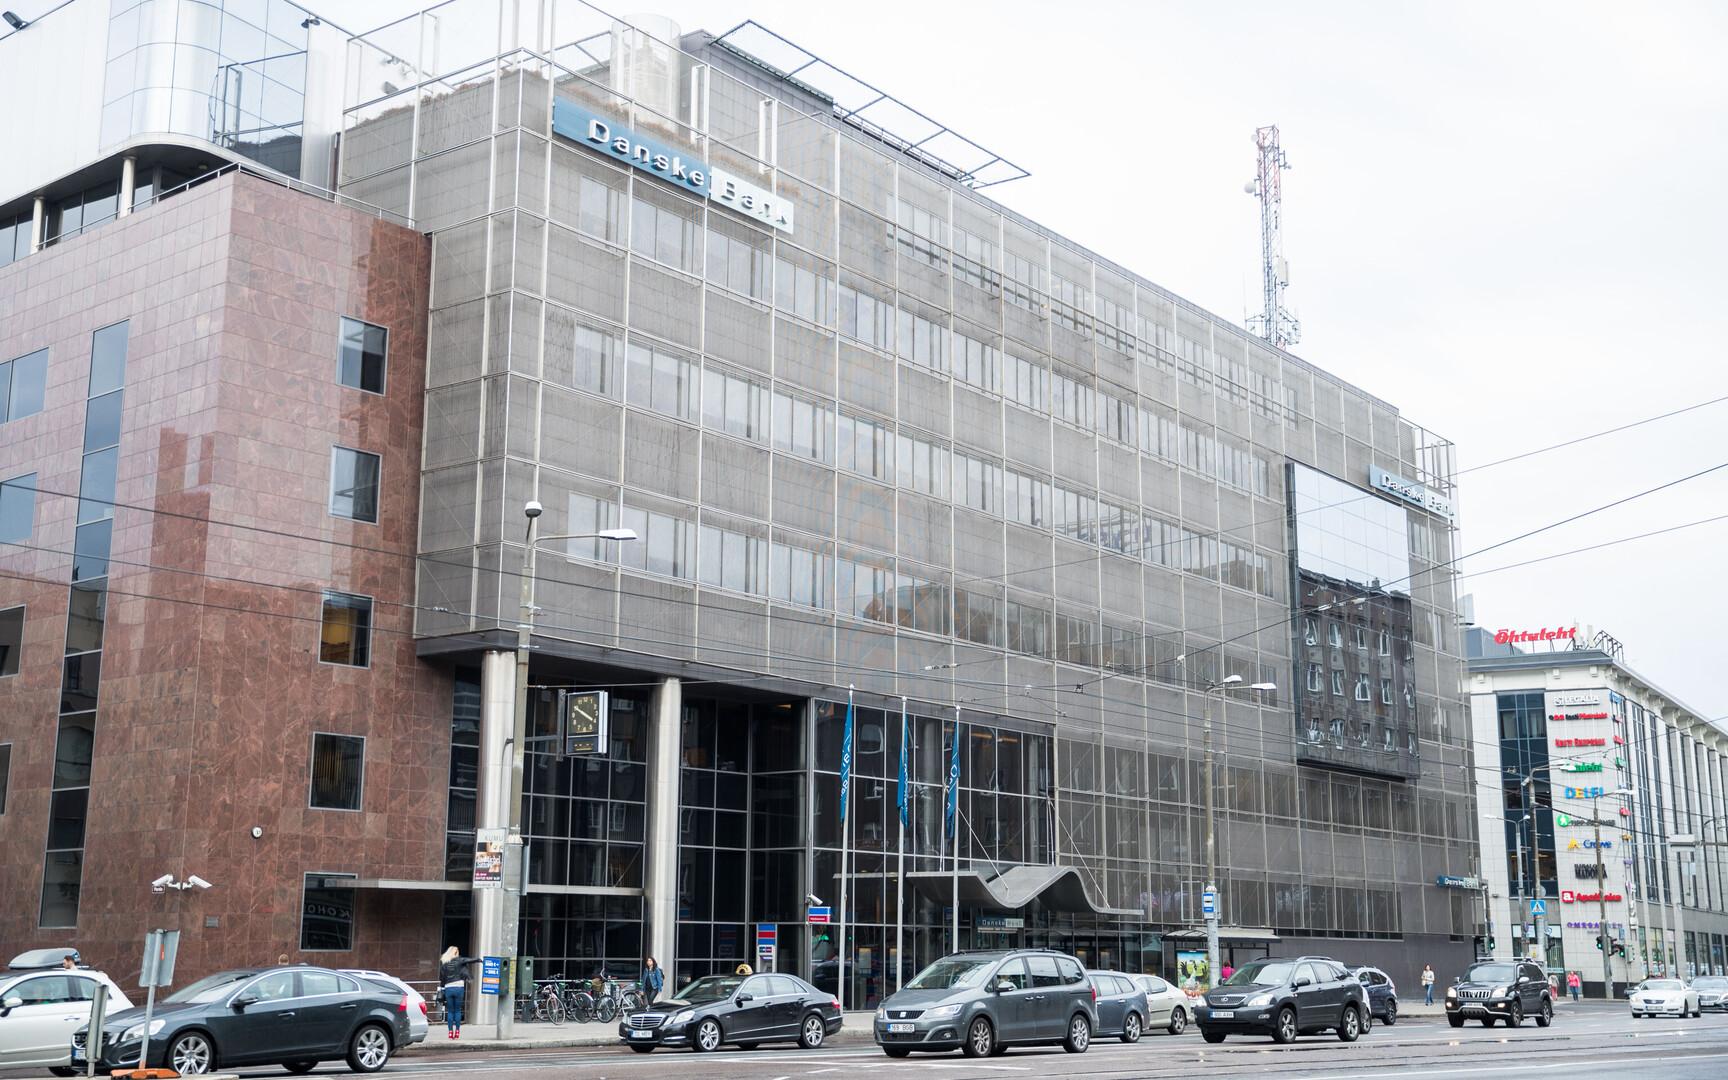 Police arrest 10 in connection with Danske money laundering